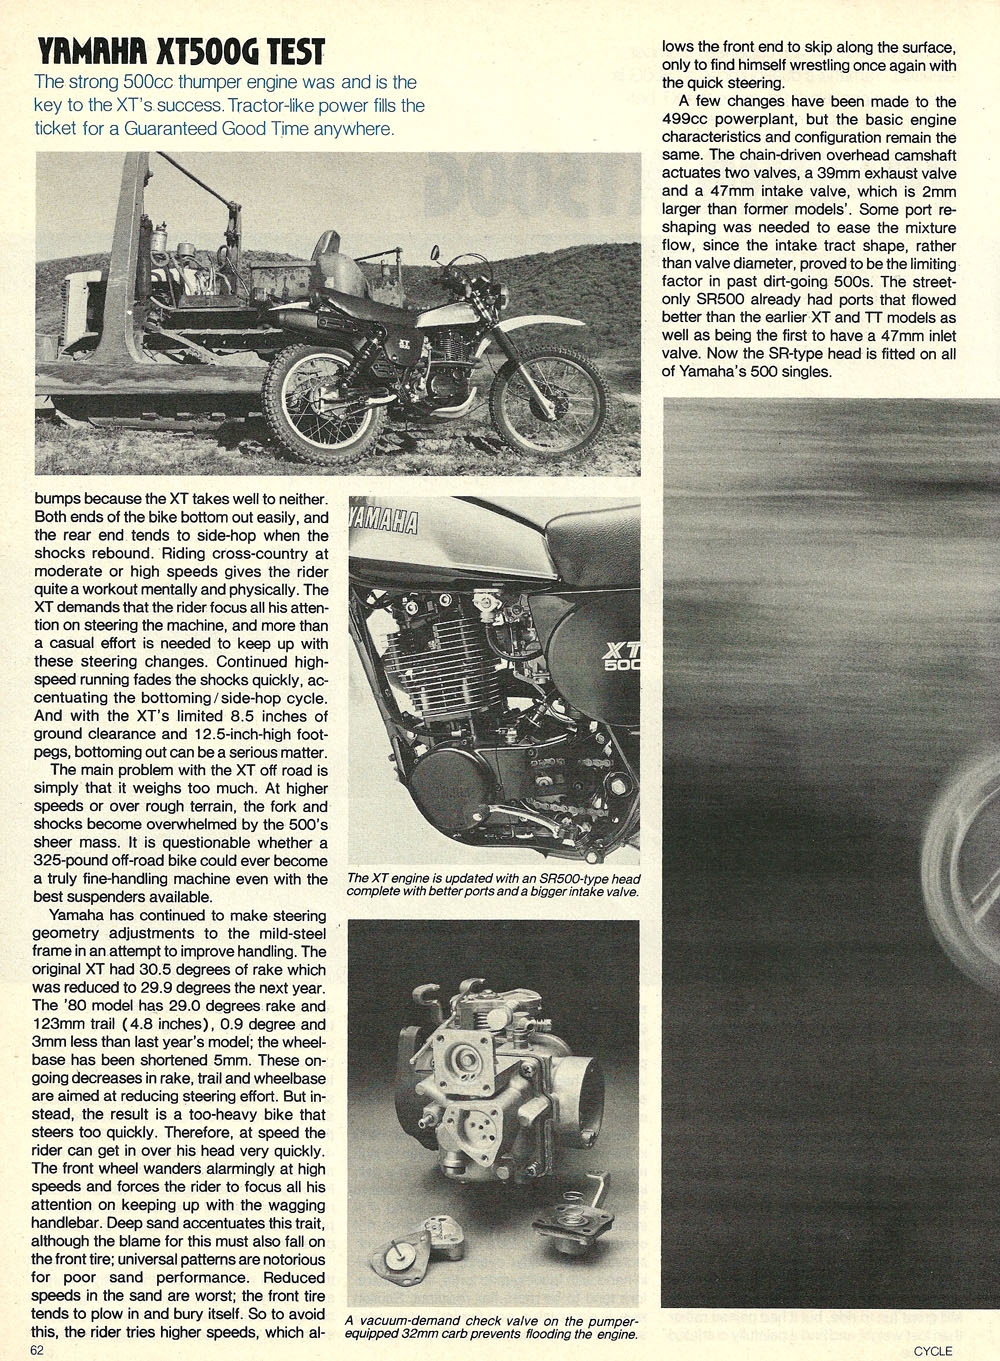 1980 Yamaha XT500G road test 02.jpg